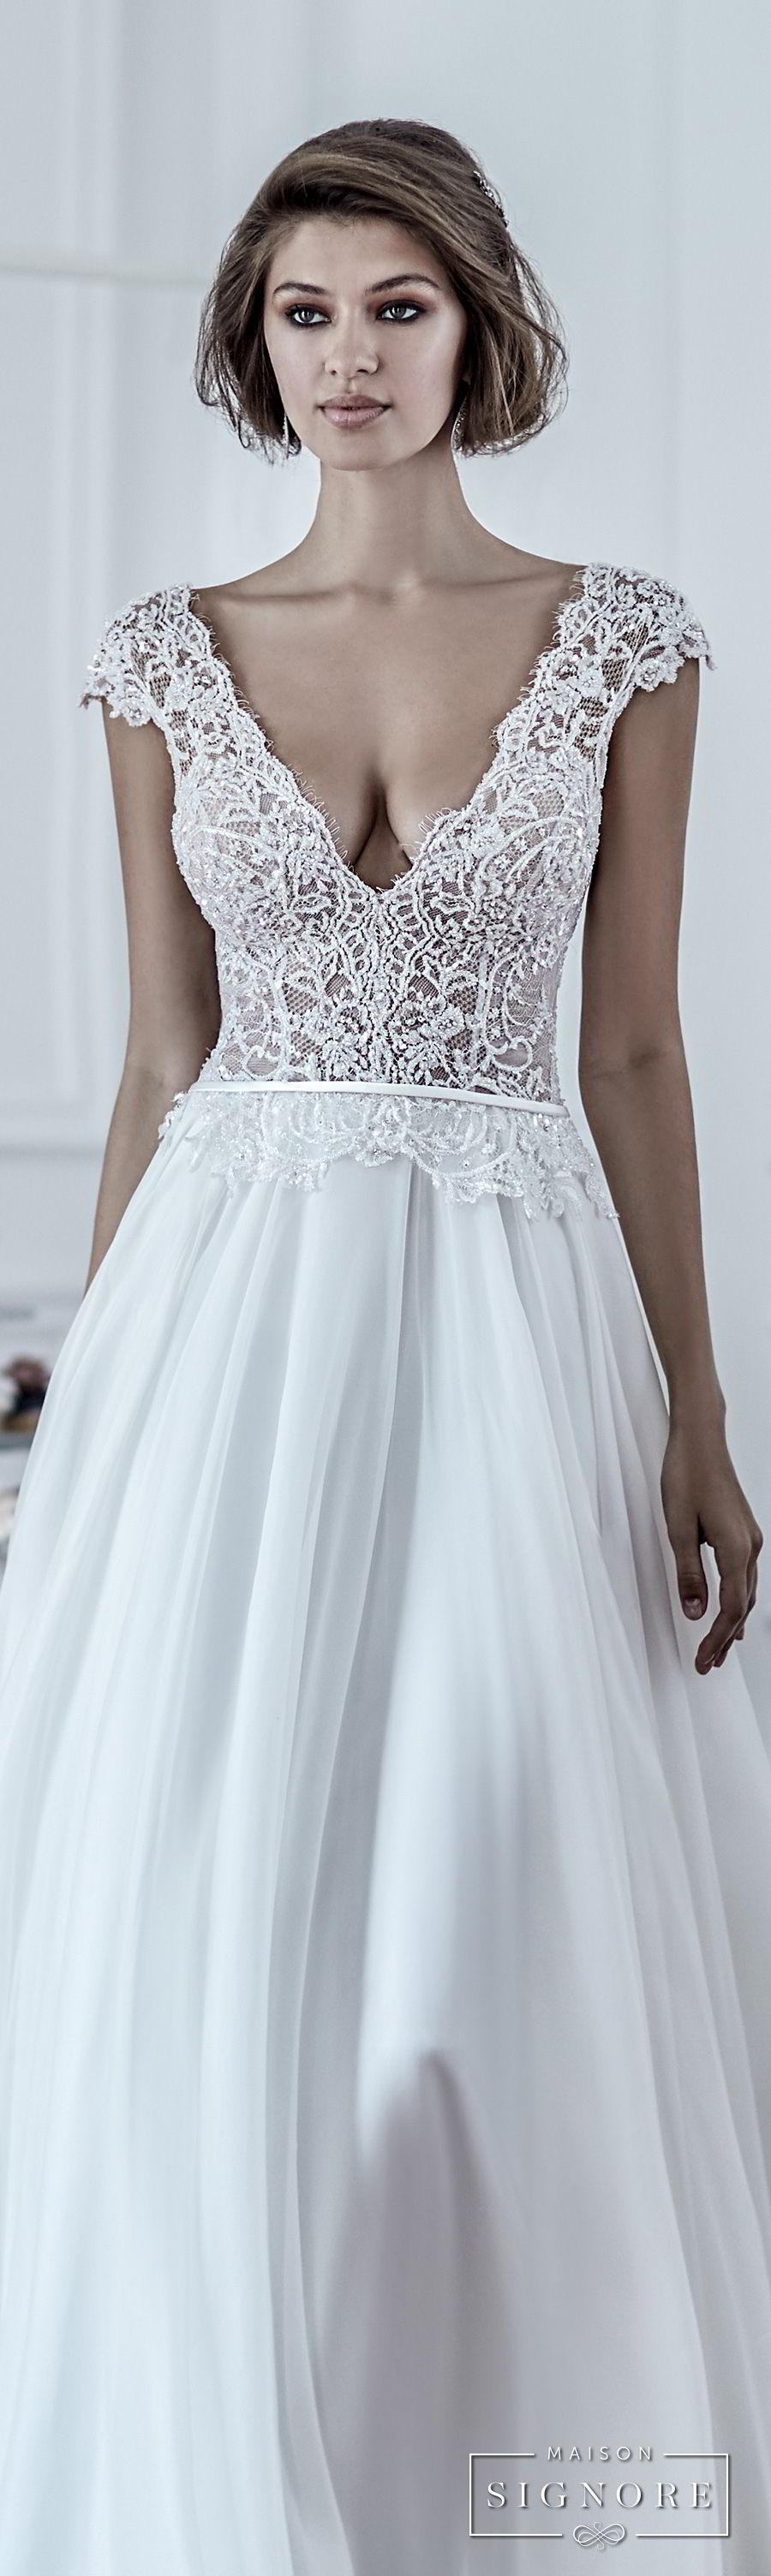 maison signore 2017 bridal cap sleeves deep v neck heavily embellished romantic sexy pastel blue soft a  line wedding dress chapel train (duchessa) lv